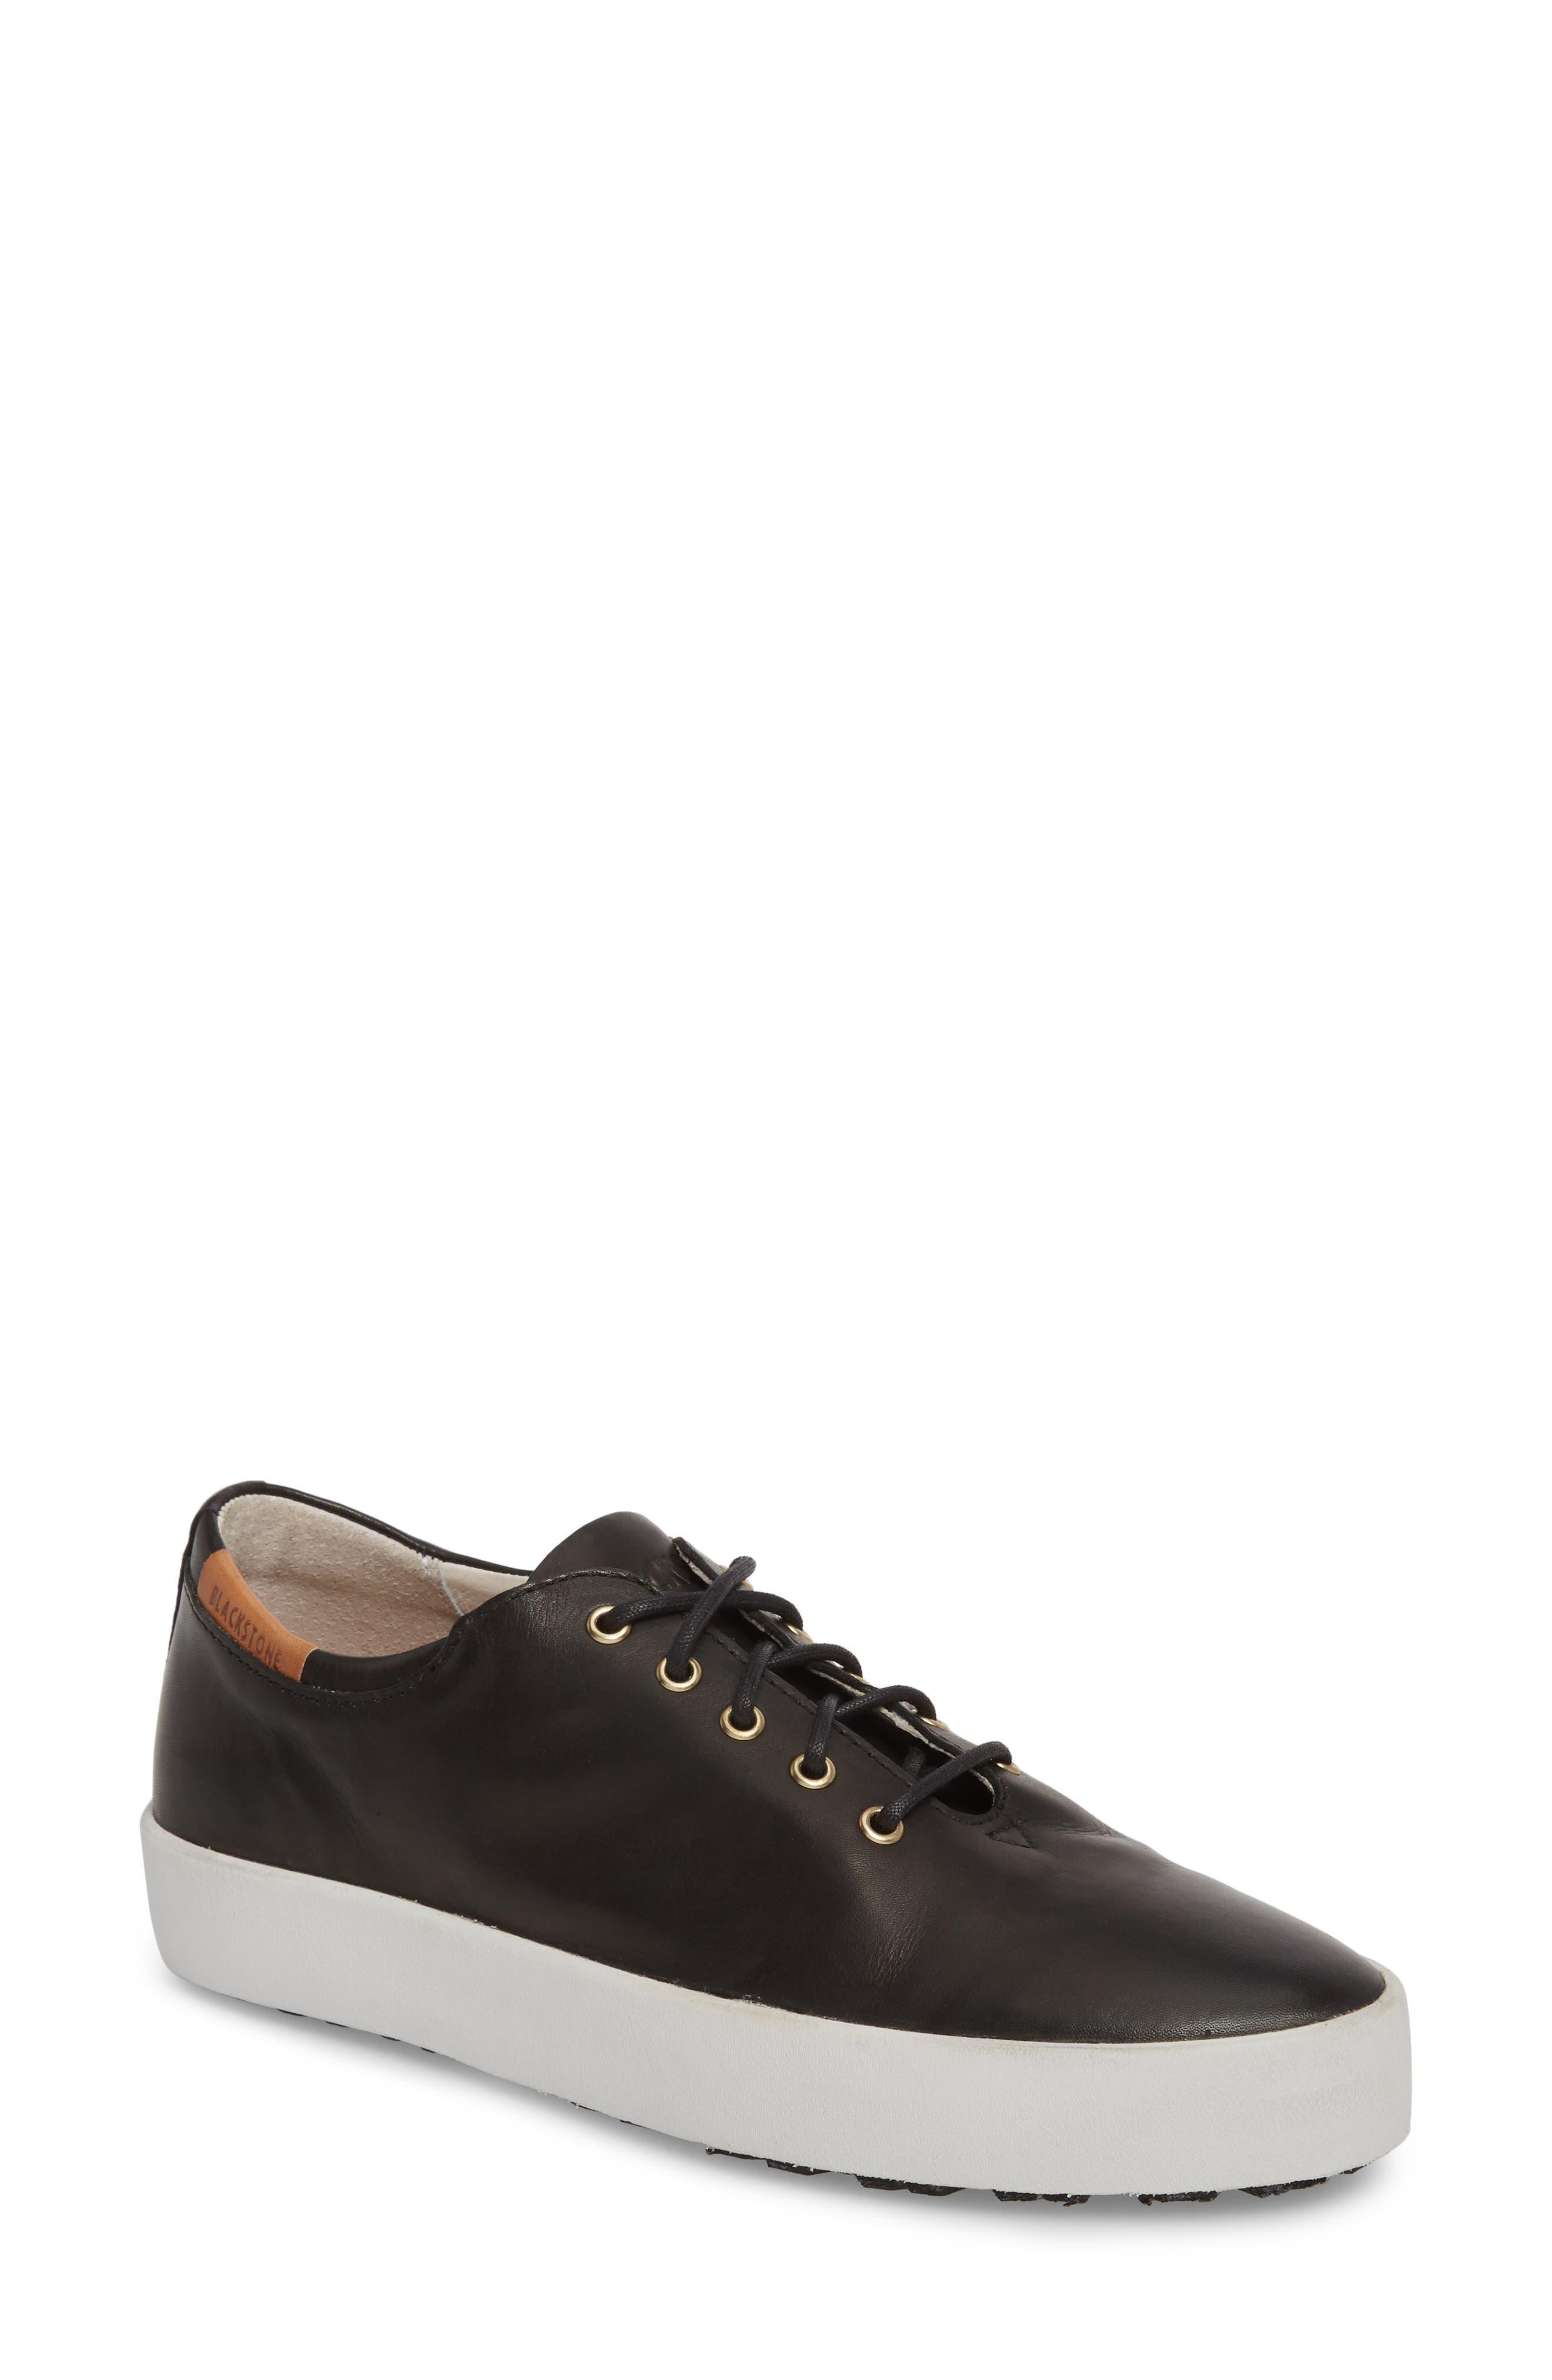 PL74 Sneaker,                             Main thumbnail 1, color,                             Black Leather